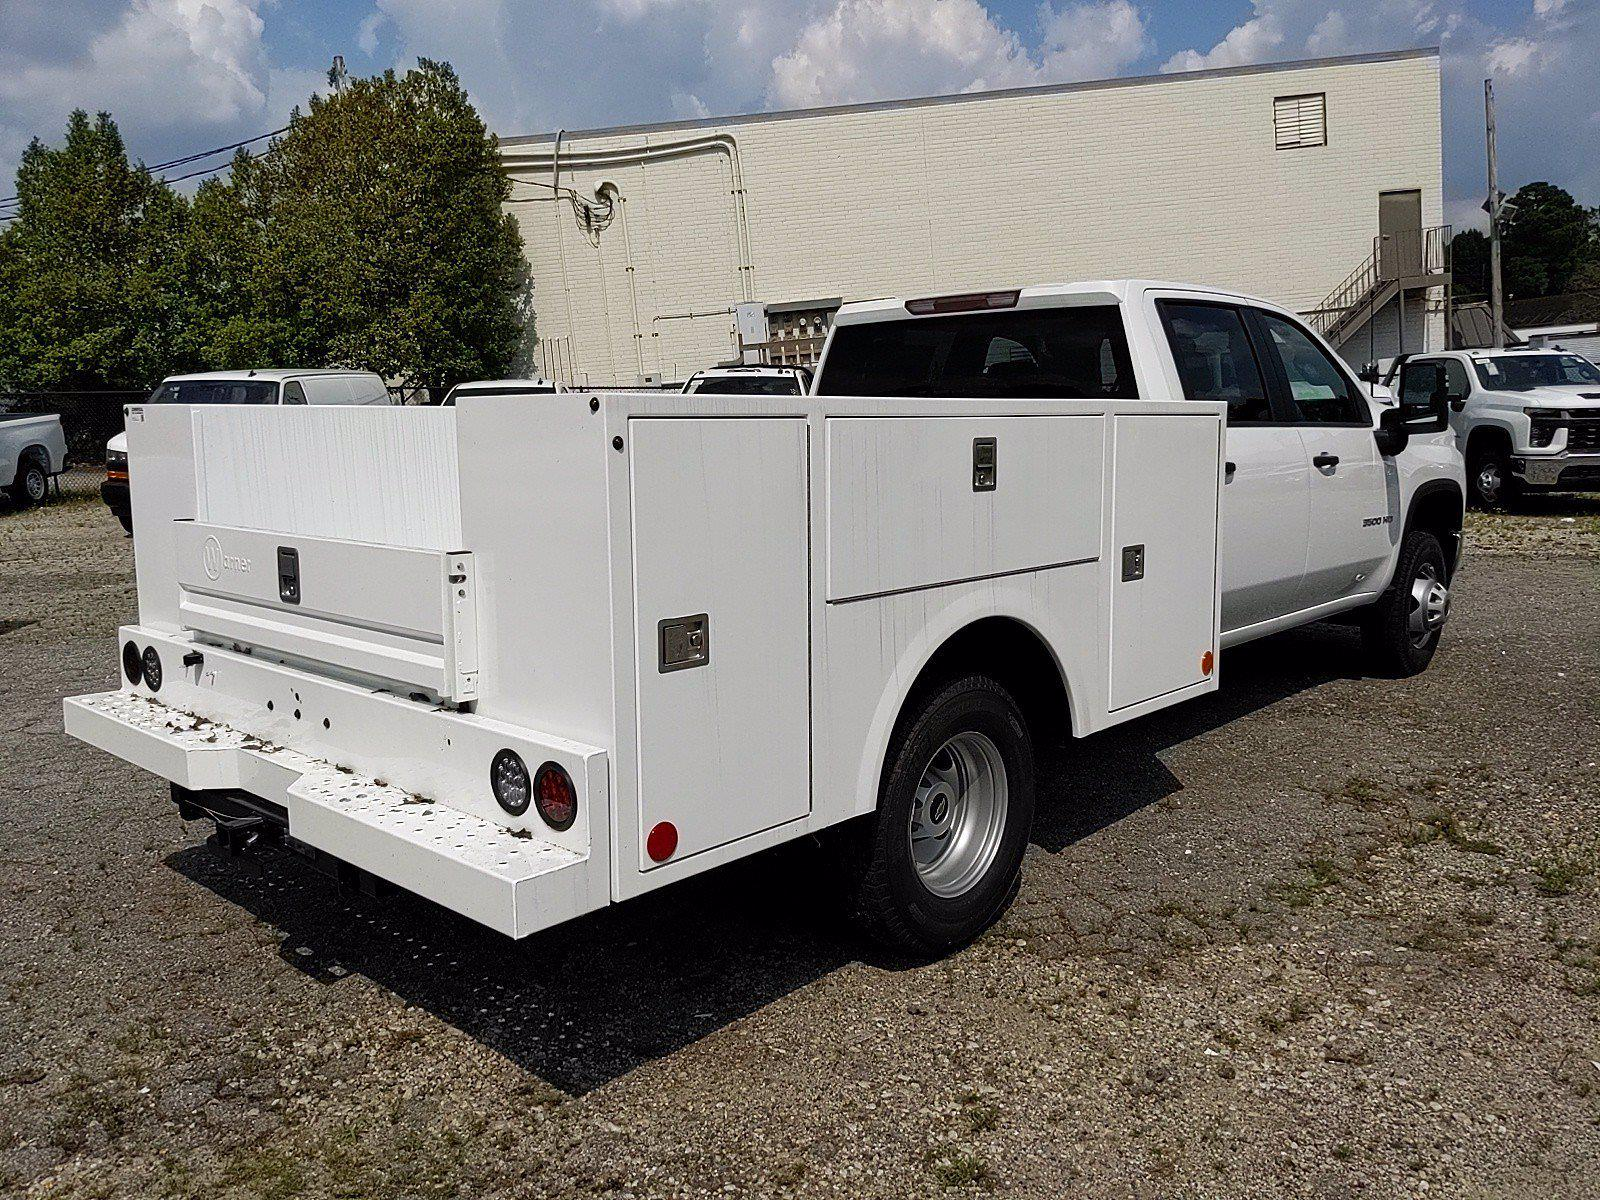 2021 Silverado 3500 Crew Cab 4x2,  Warner Truck Bodies Service Body #351042 - photo 6